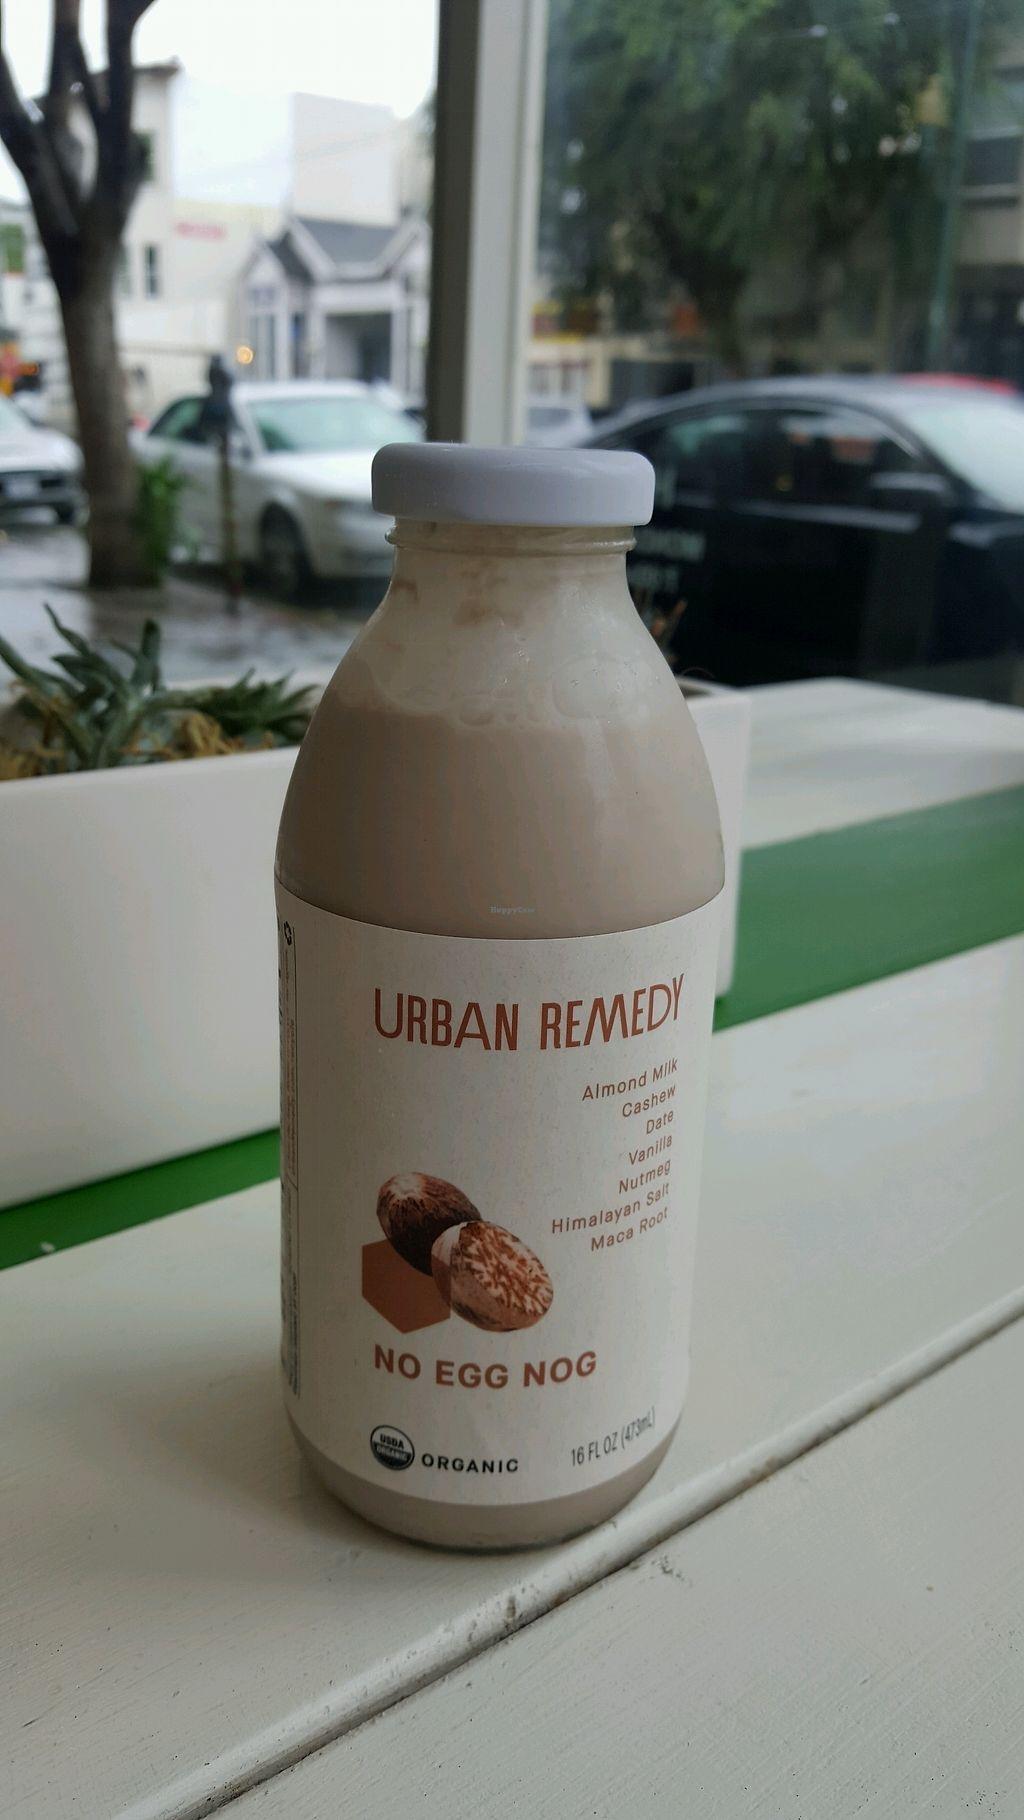 "Photo of Urban Remedy  by <a href=""/members/profile/VegManda"">VegManda</a> <br/>No Egg Nog <br/> November 26, 2017  - <a href='/contact/abuse/image/62396/329430'>Report</a>"